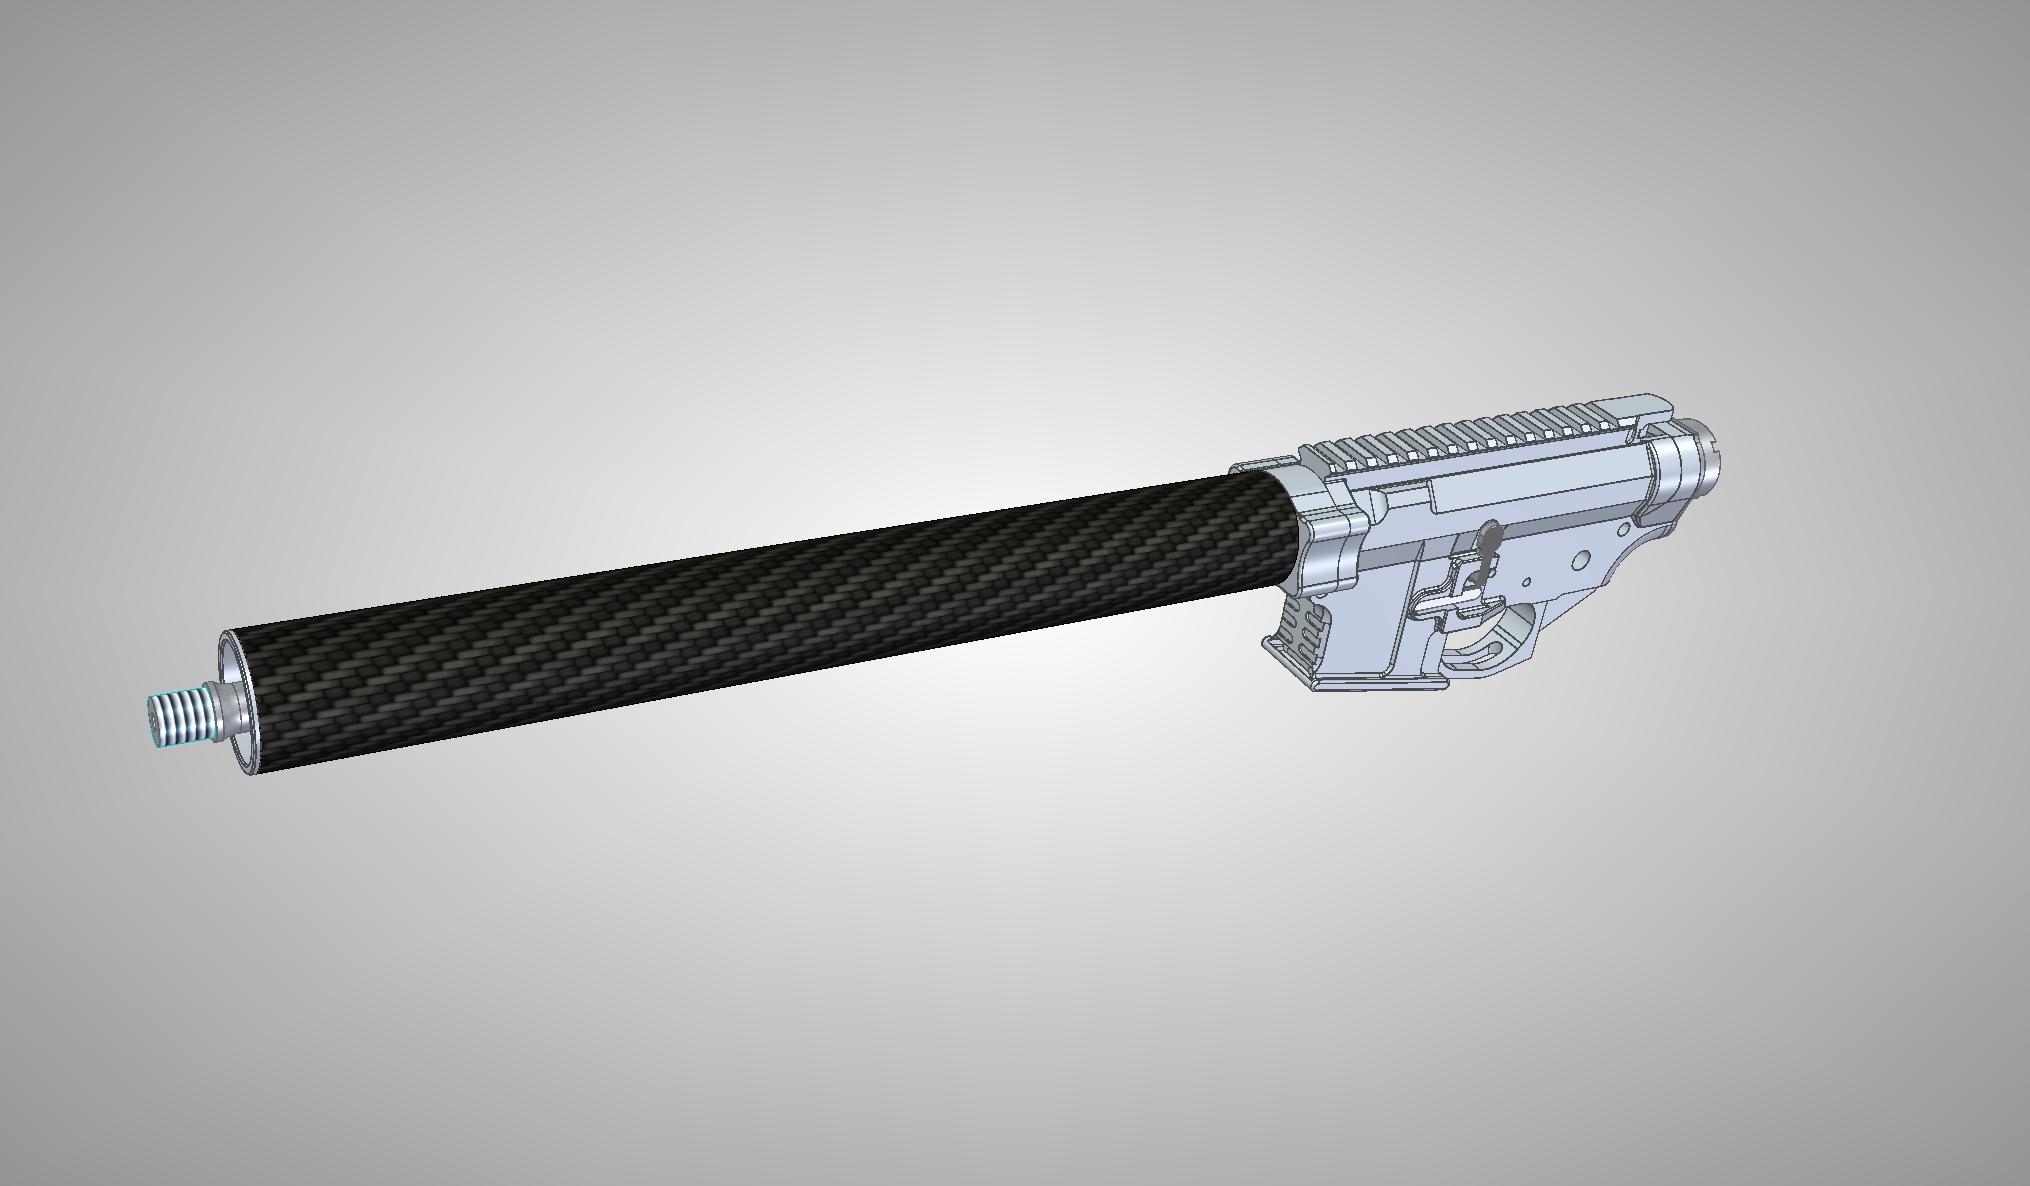 DAR IPSC DAR-15 CAD Preview 1